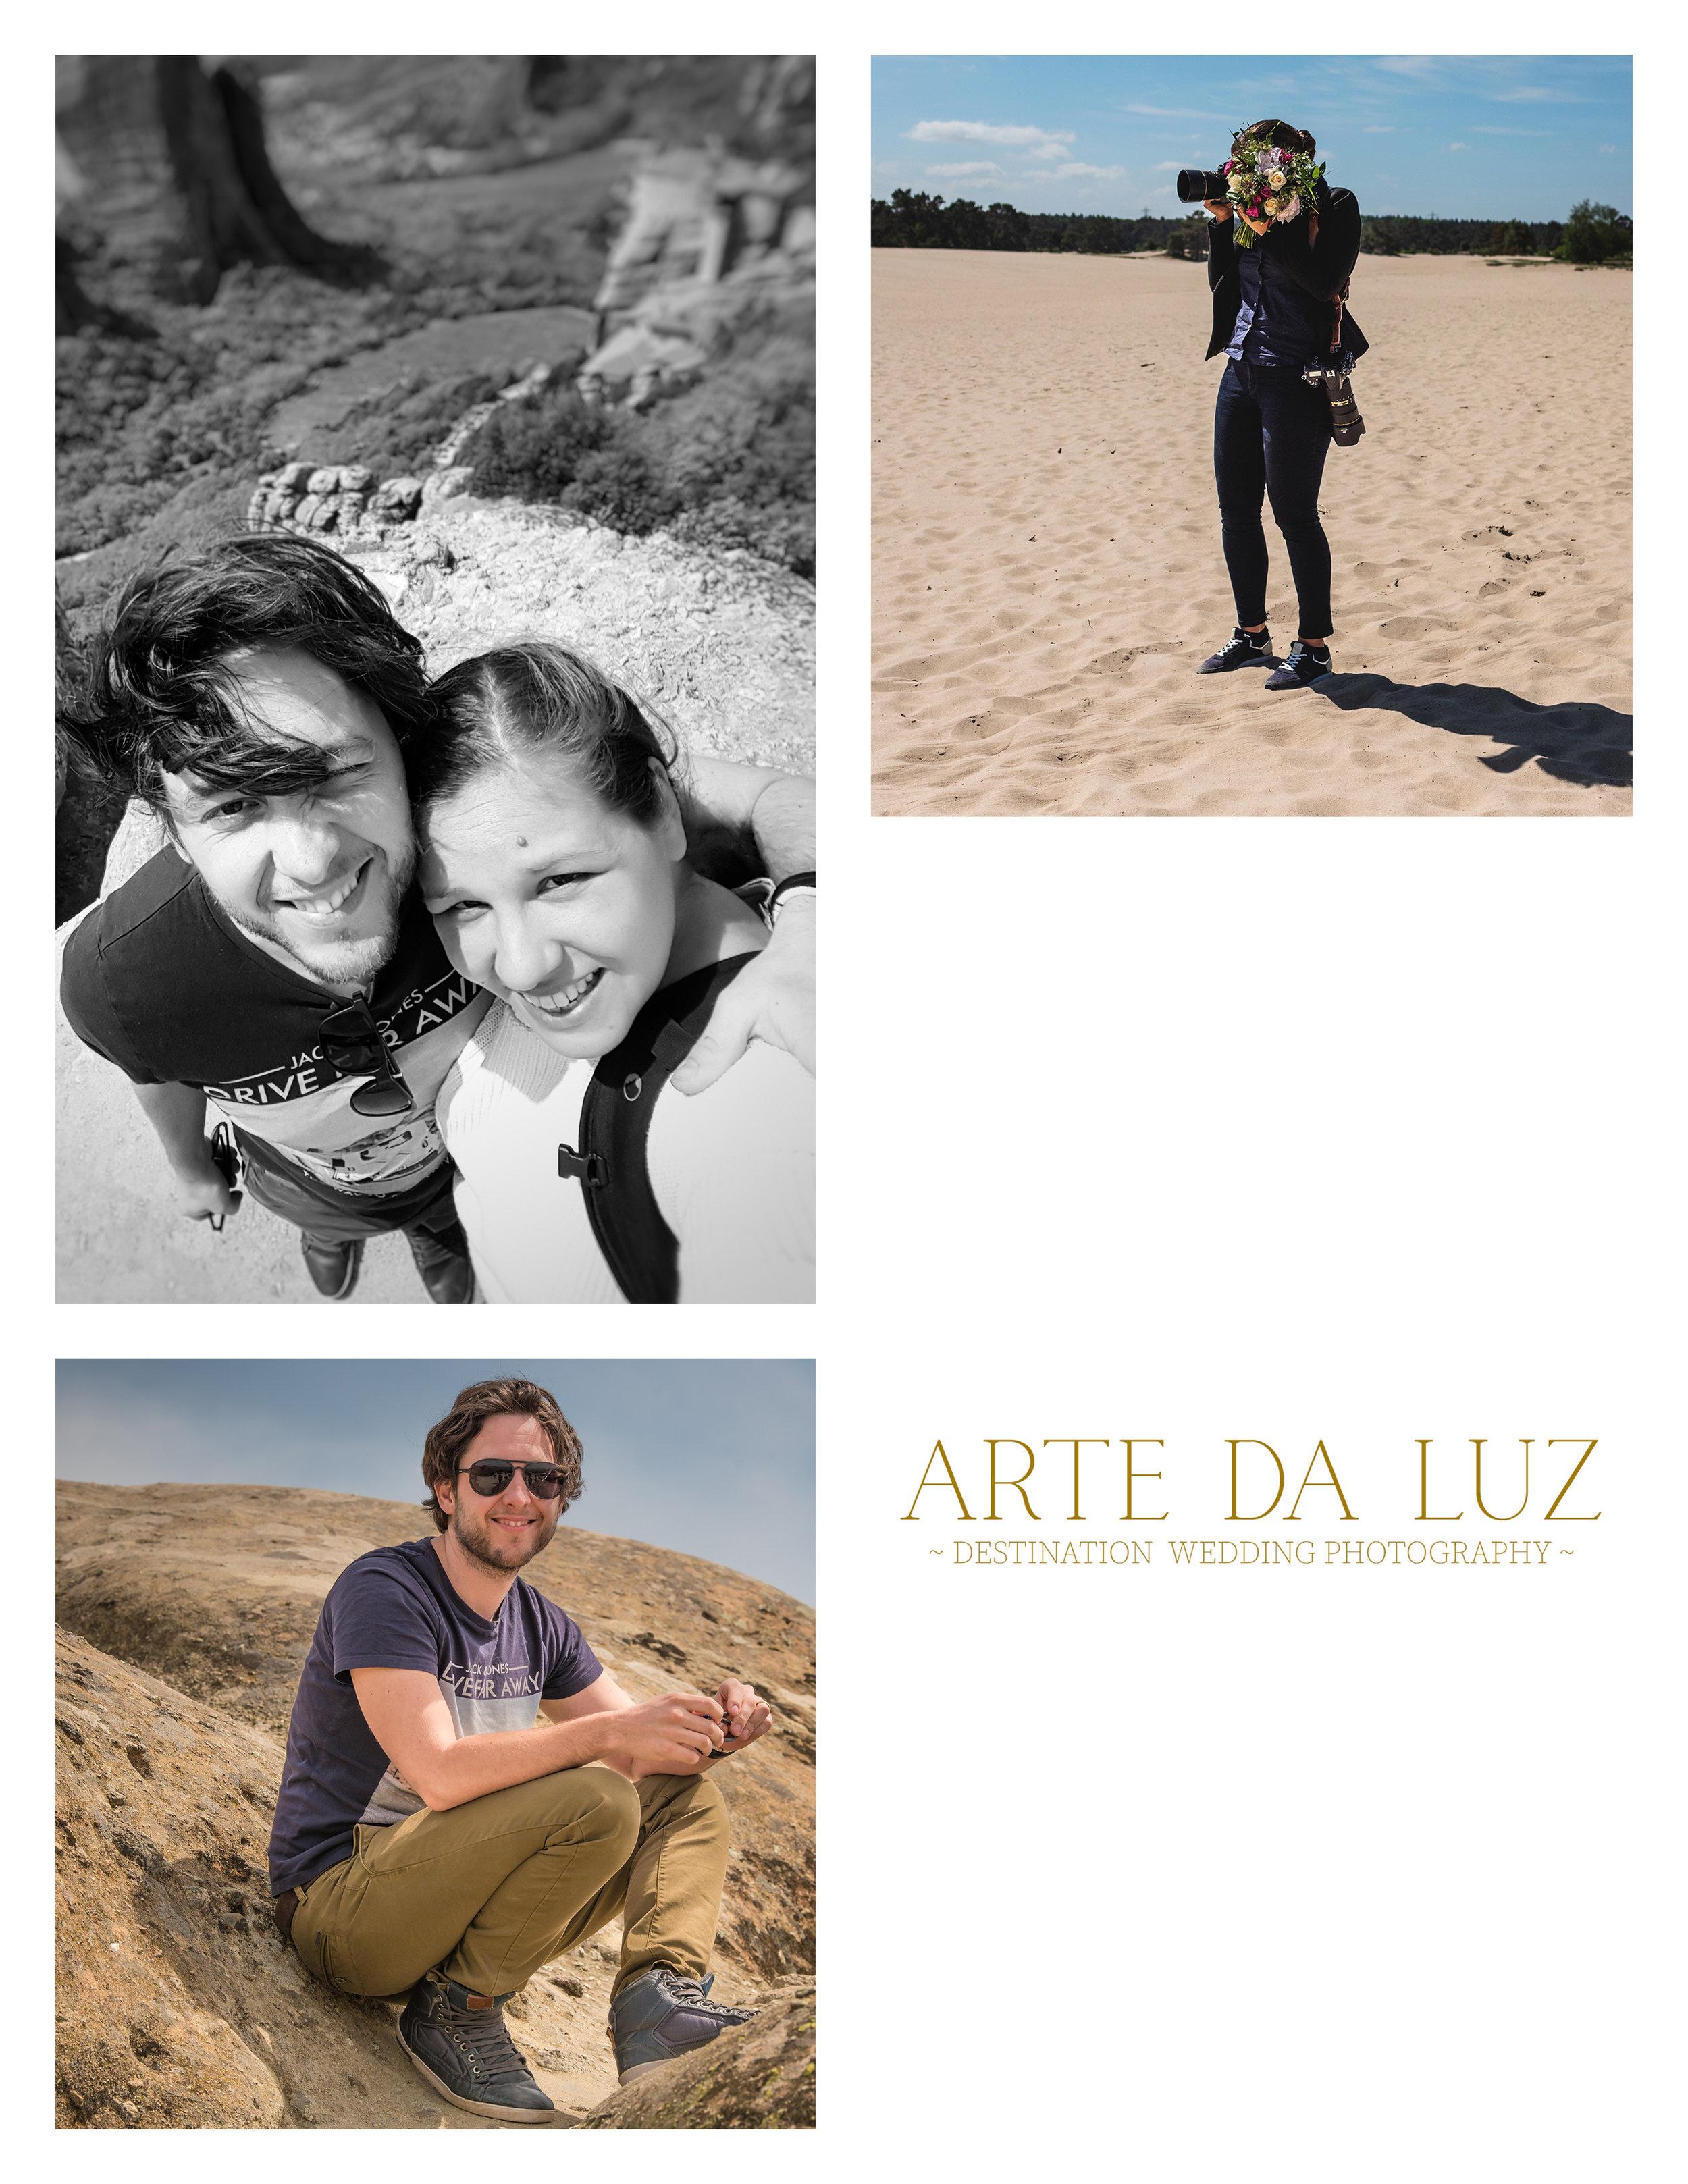 Arte Da Luz - meet the team